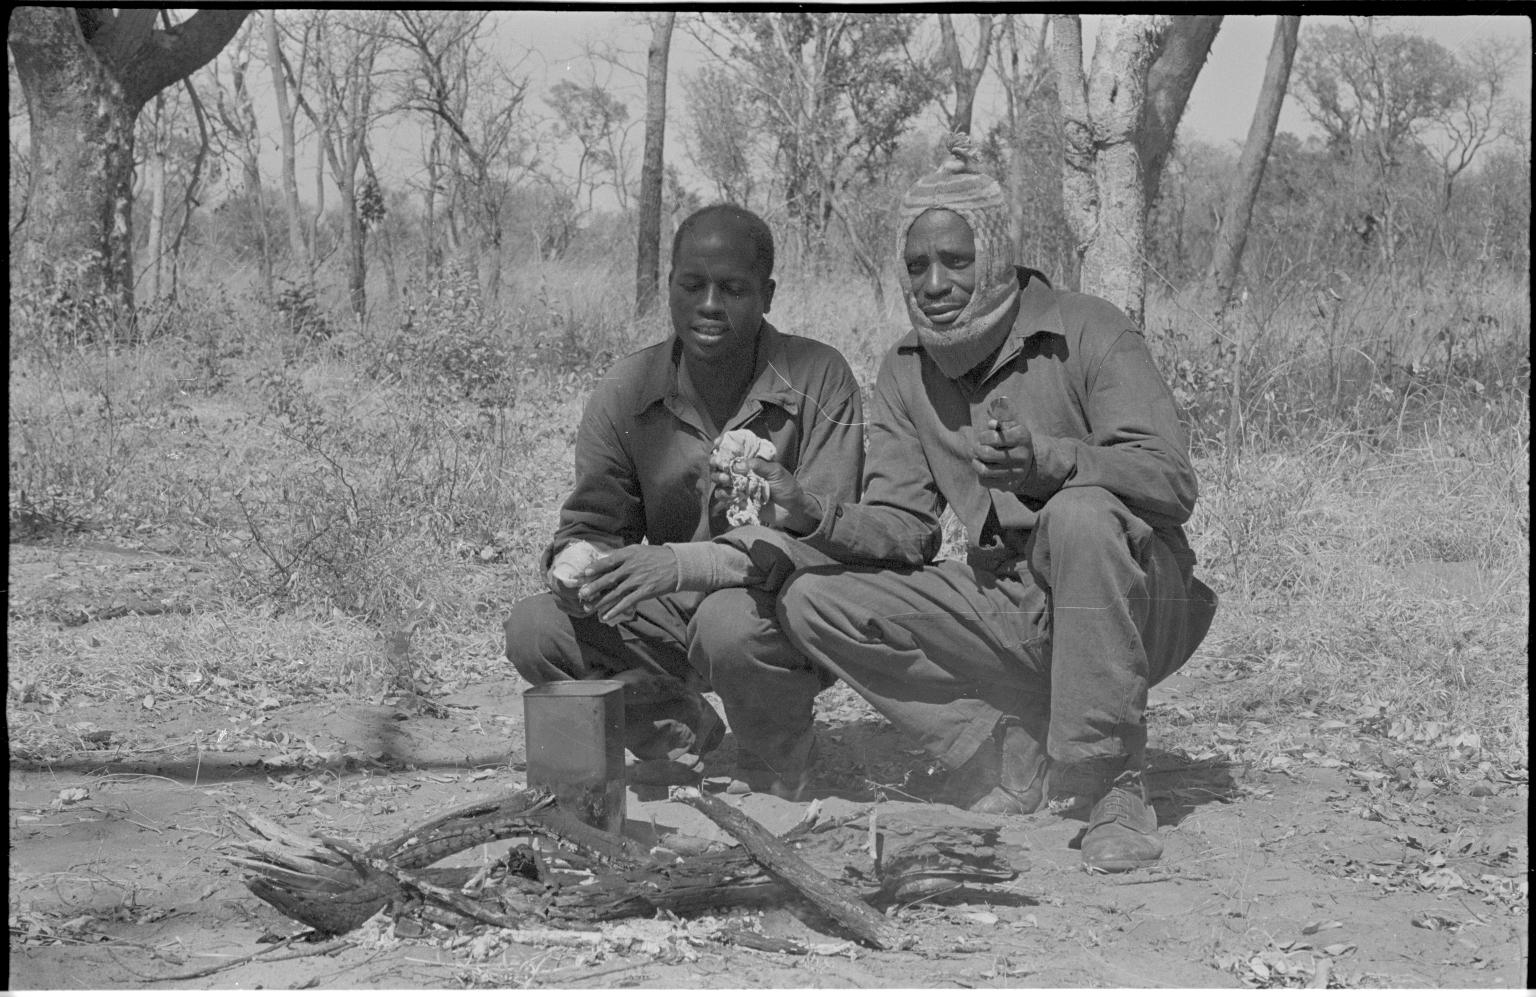 Camp site in Zimbabwe